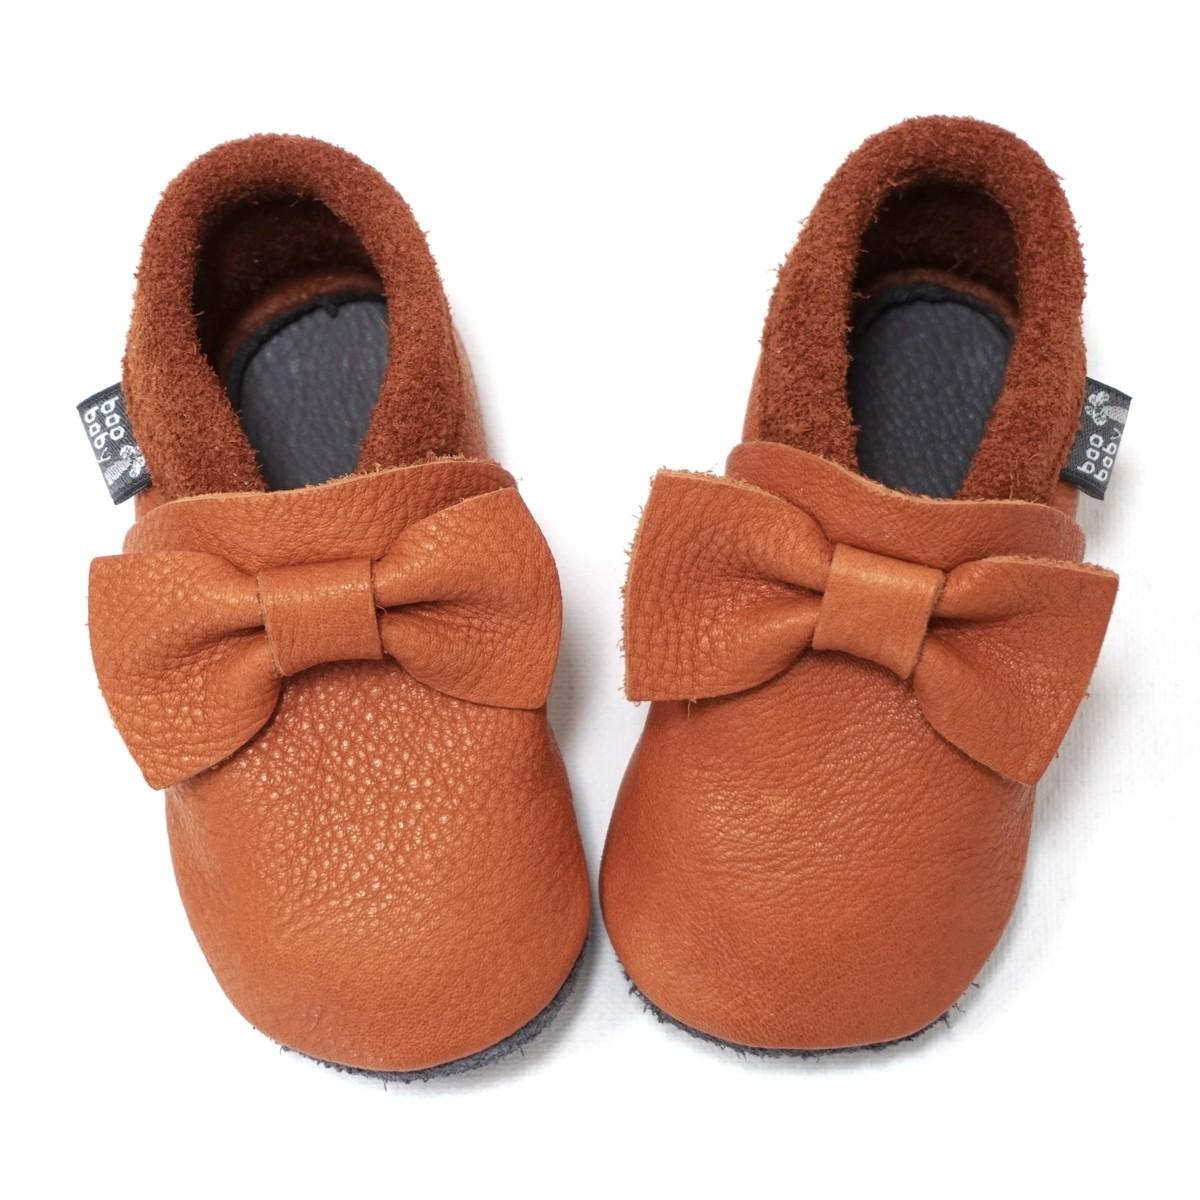 pelice dječje cipelice